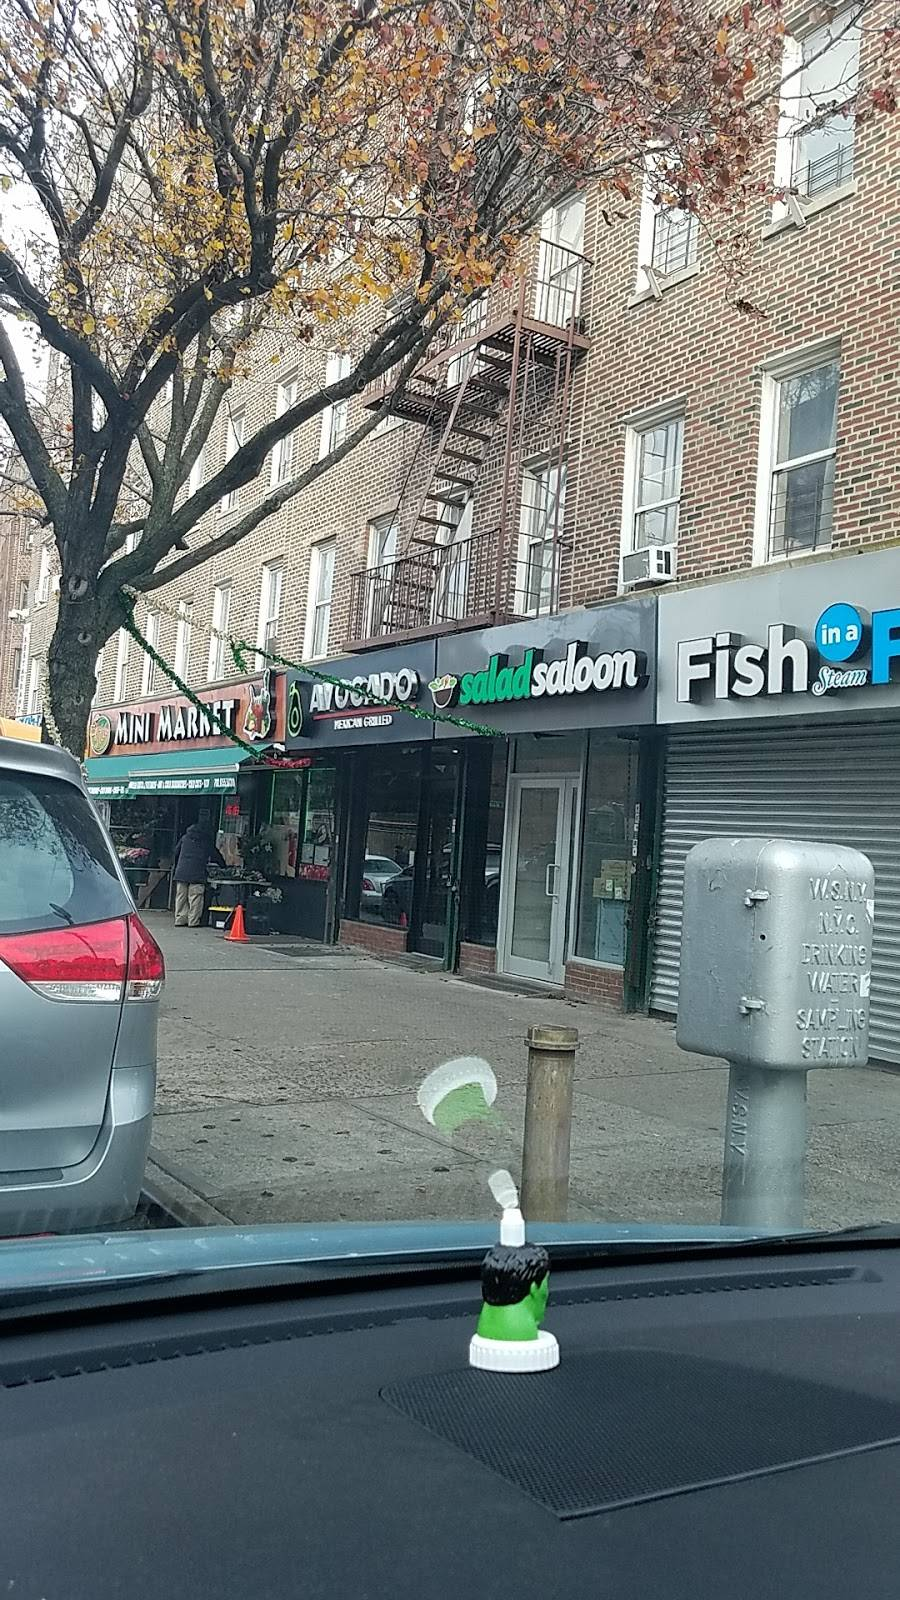 Avocado Salad Saloon Mexican Grilled   restaurant   147 E Gun Hill Rd, Bronx, NY 10467, USA   3473468901 OR +1 347-346-8901